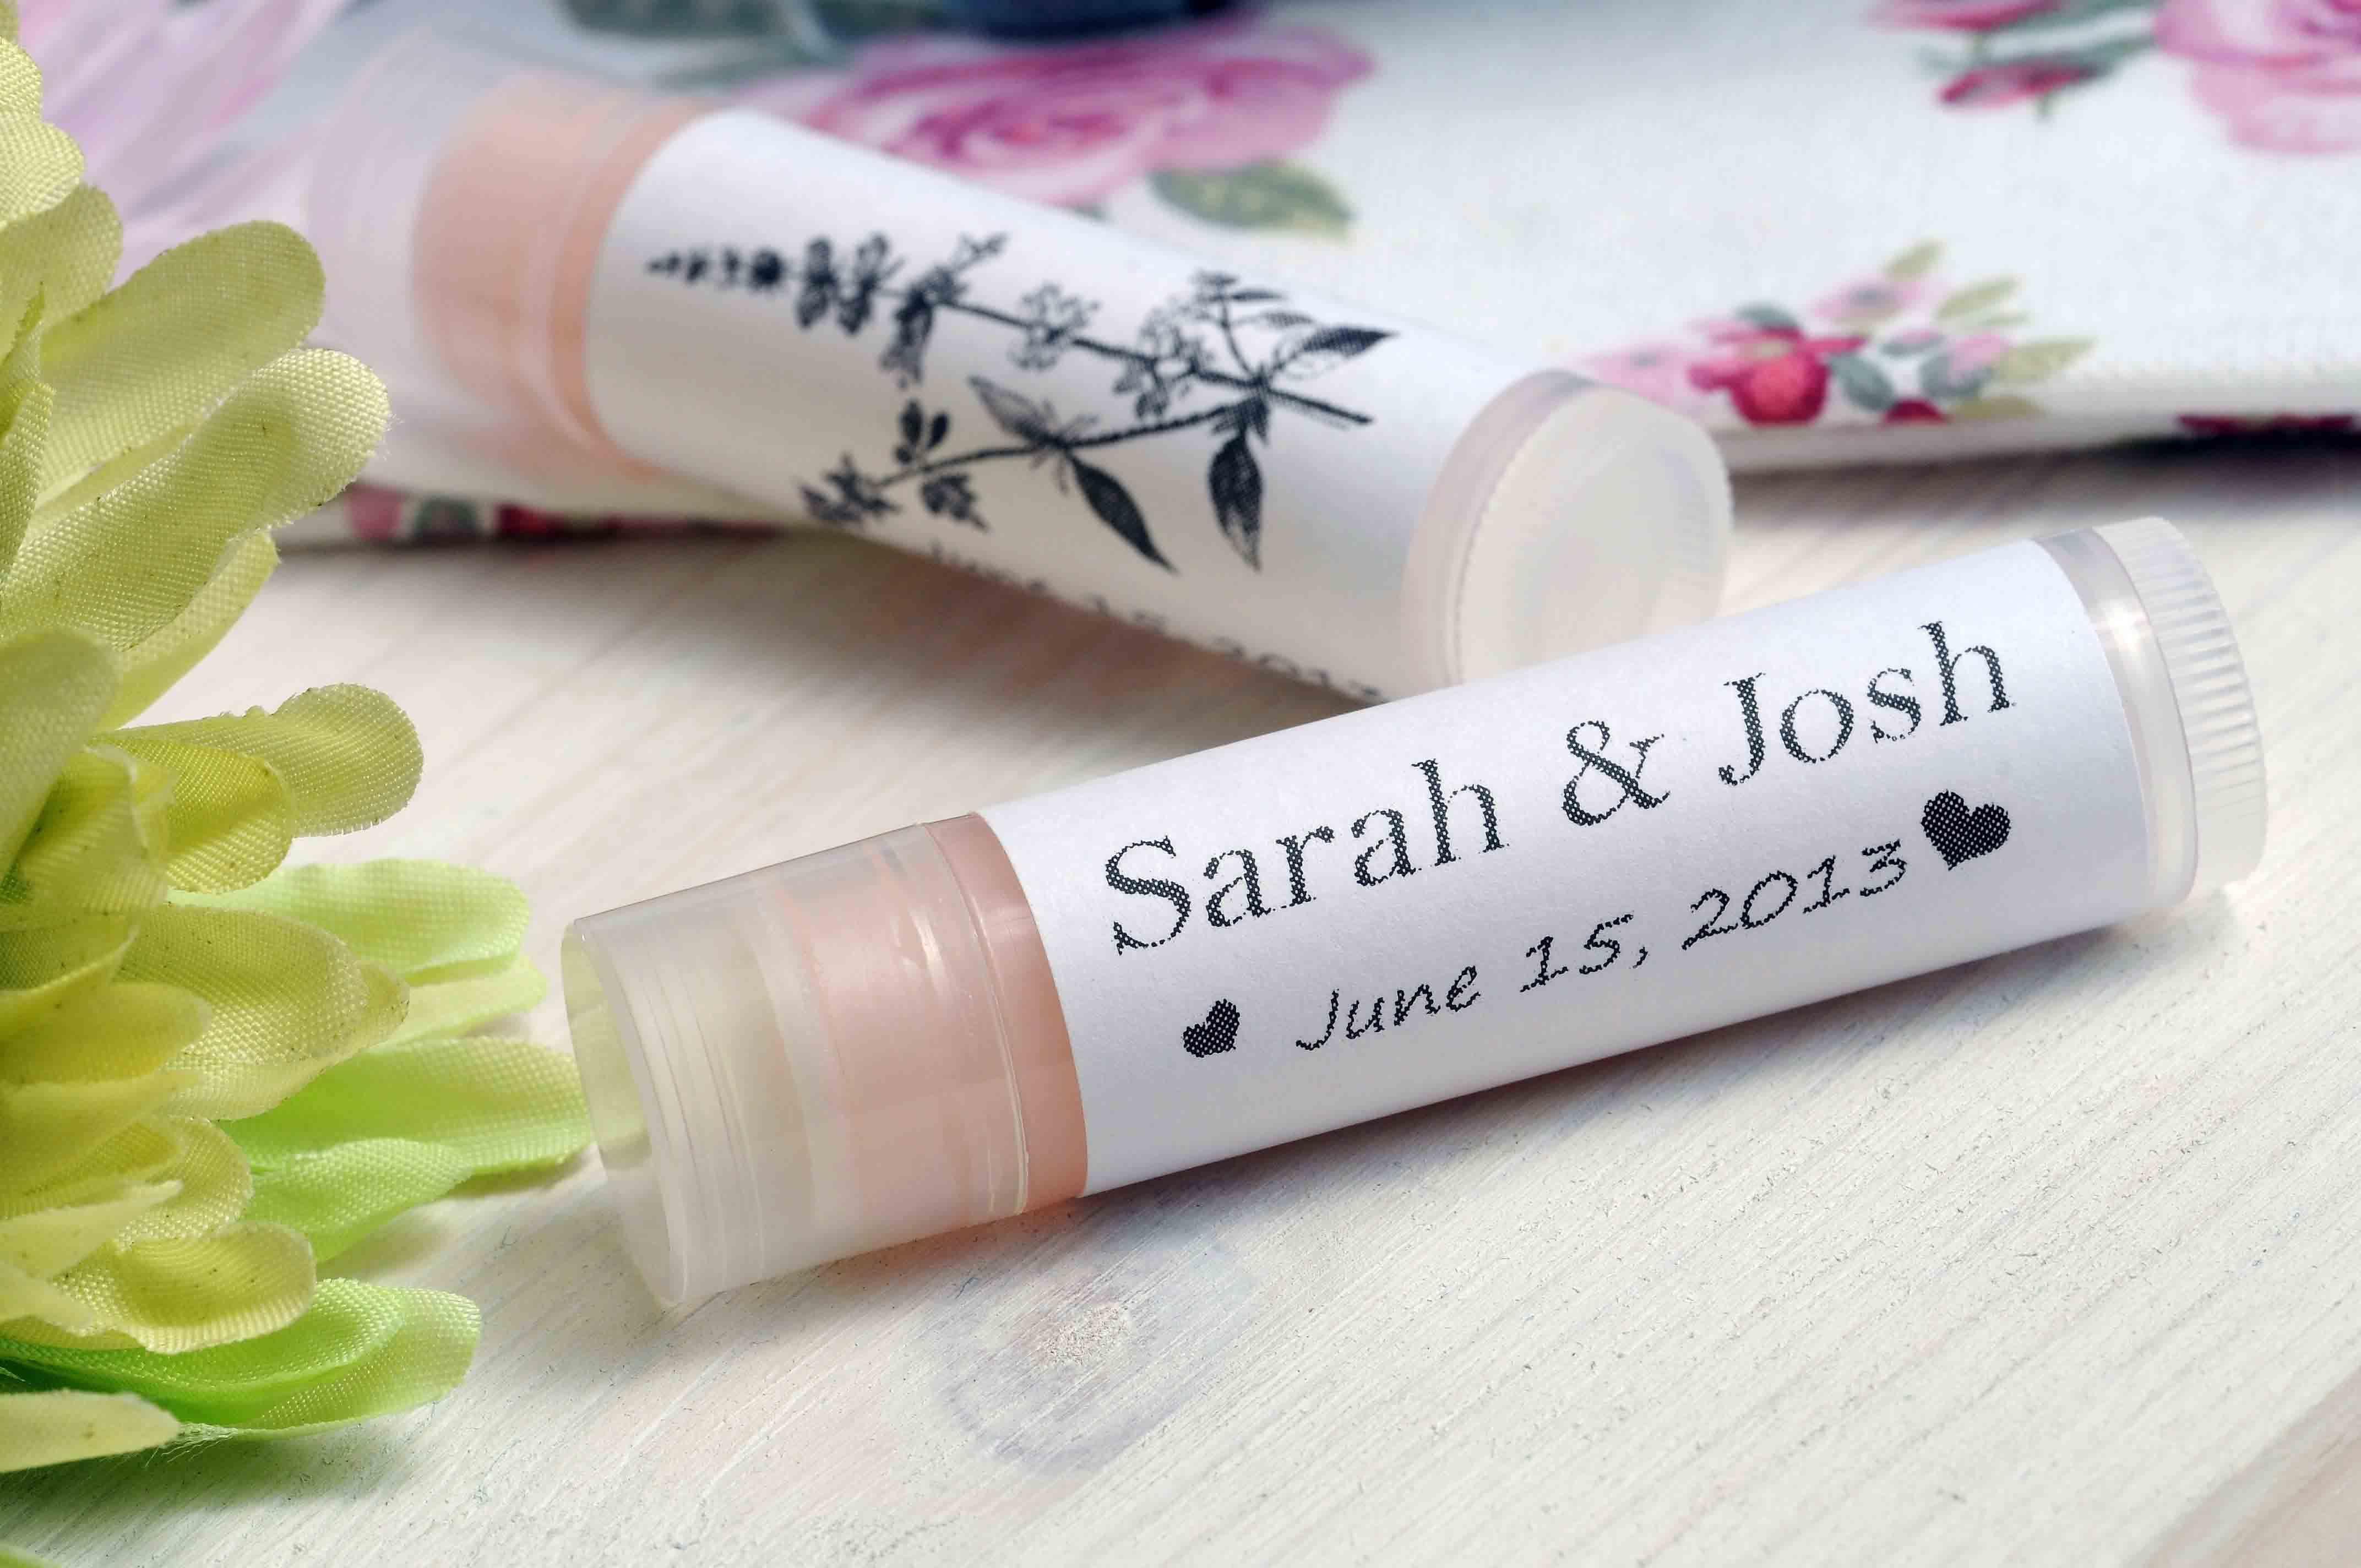 Personalized Lip Balm Favors | Pinterest Mini-Mall Viral Board ...